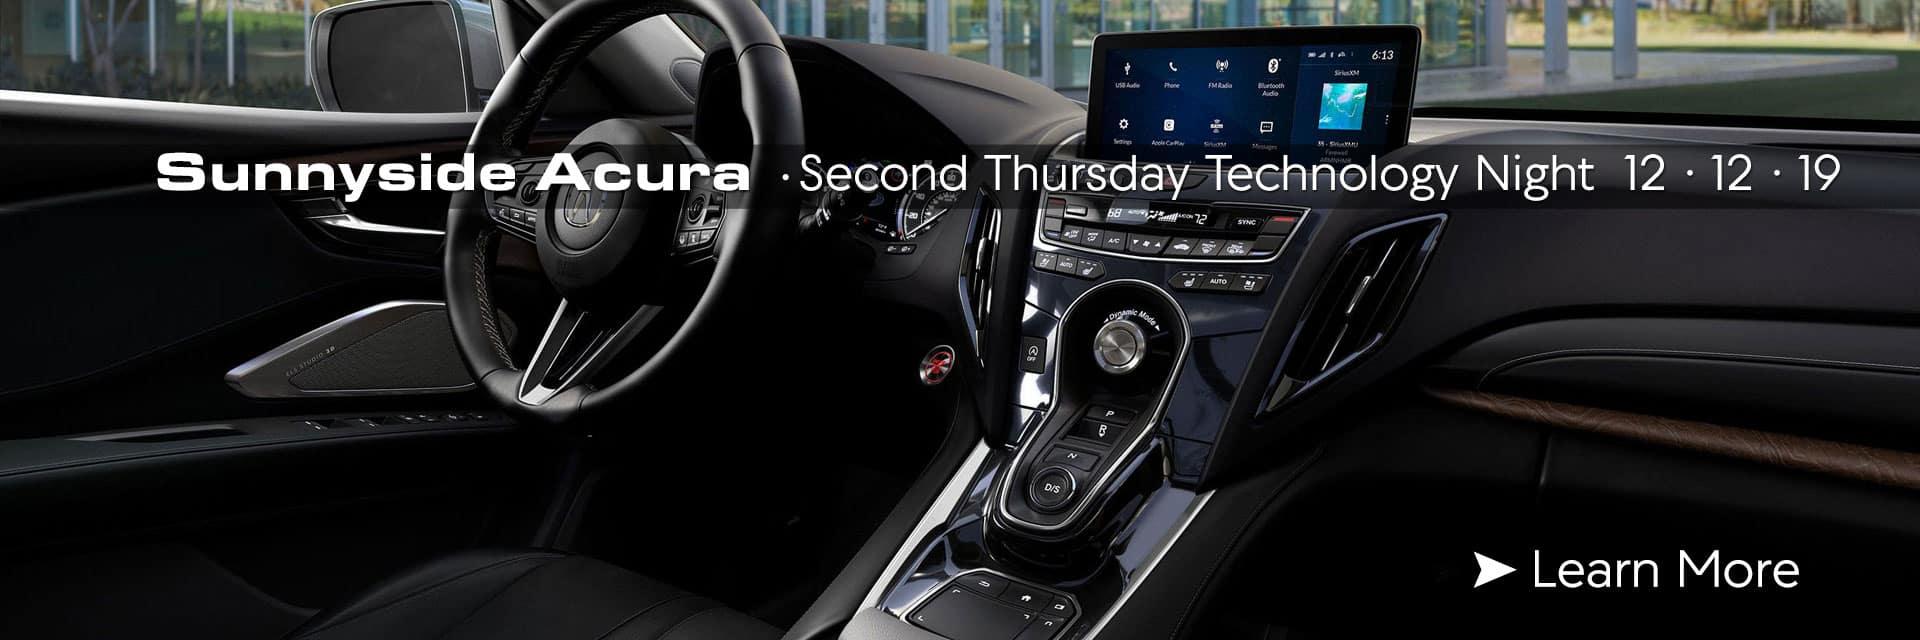 Sunnyside Acura Technology Night December 12 Nashua NH